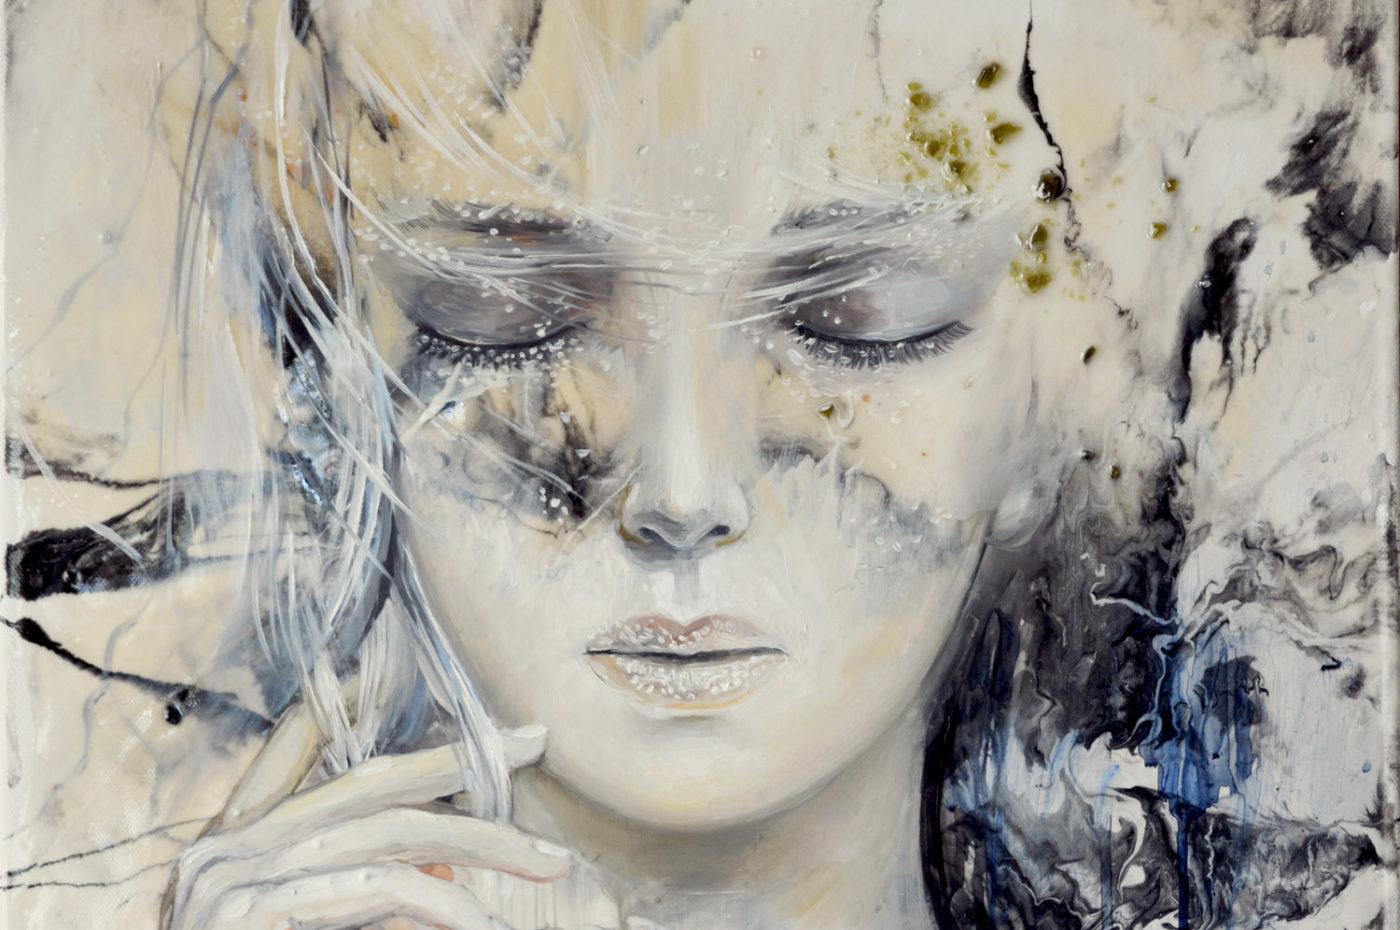 Marble resin art by Milena Gaytandzhieva artist